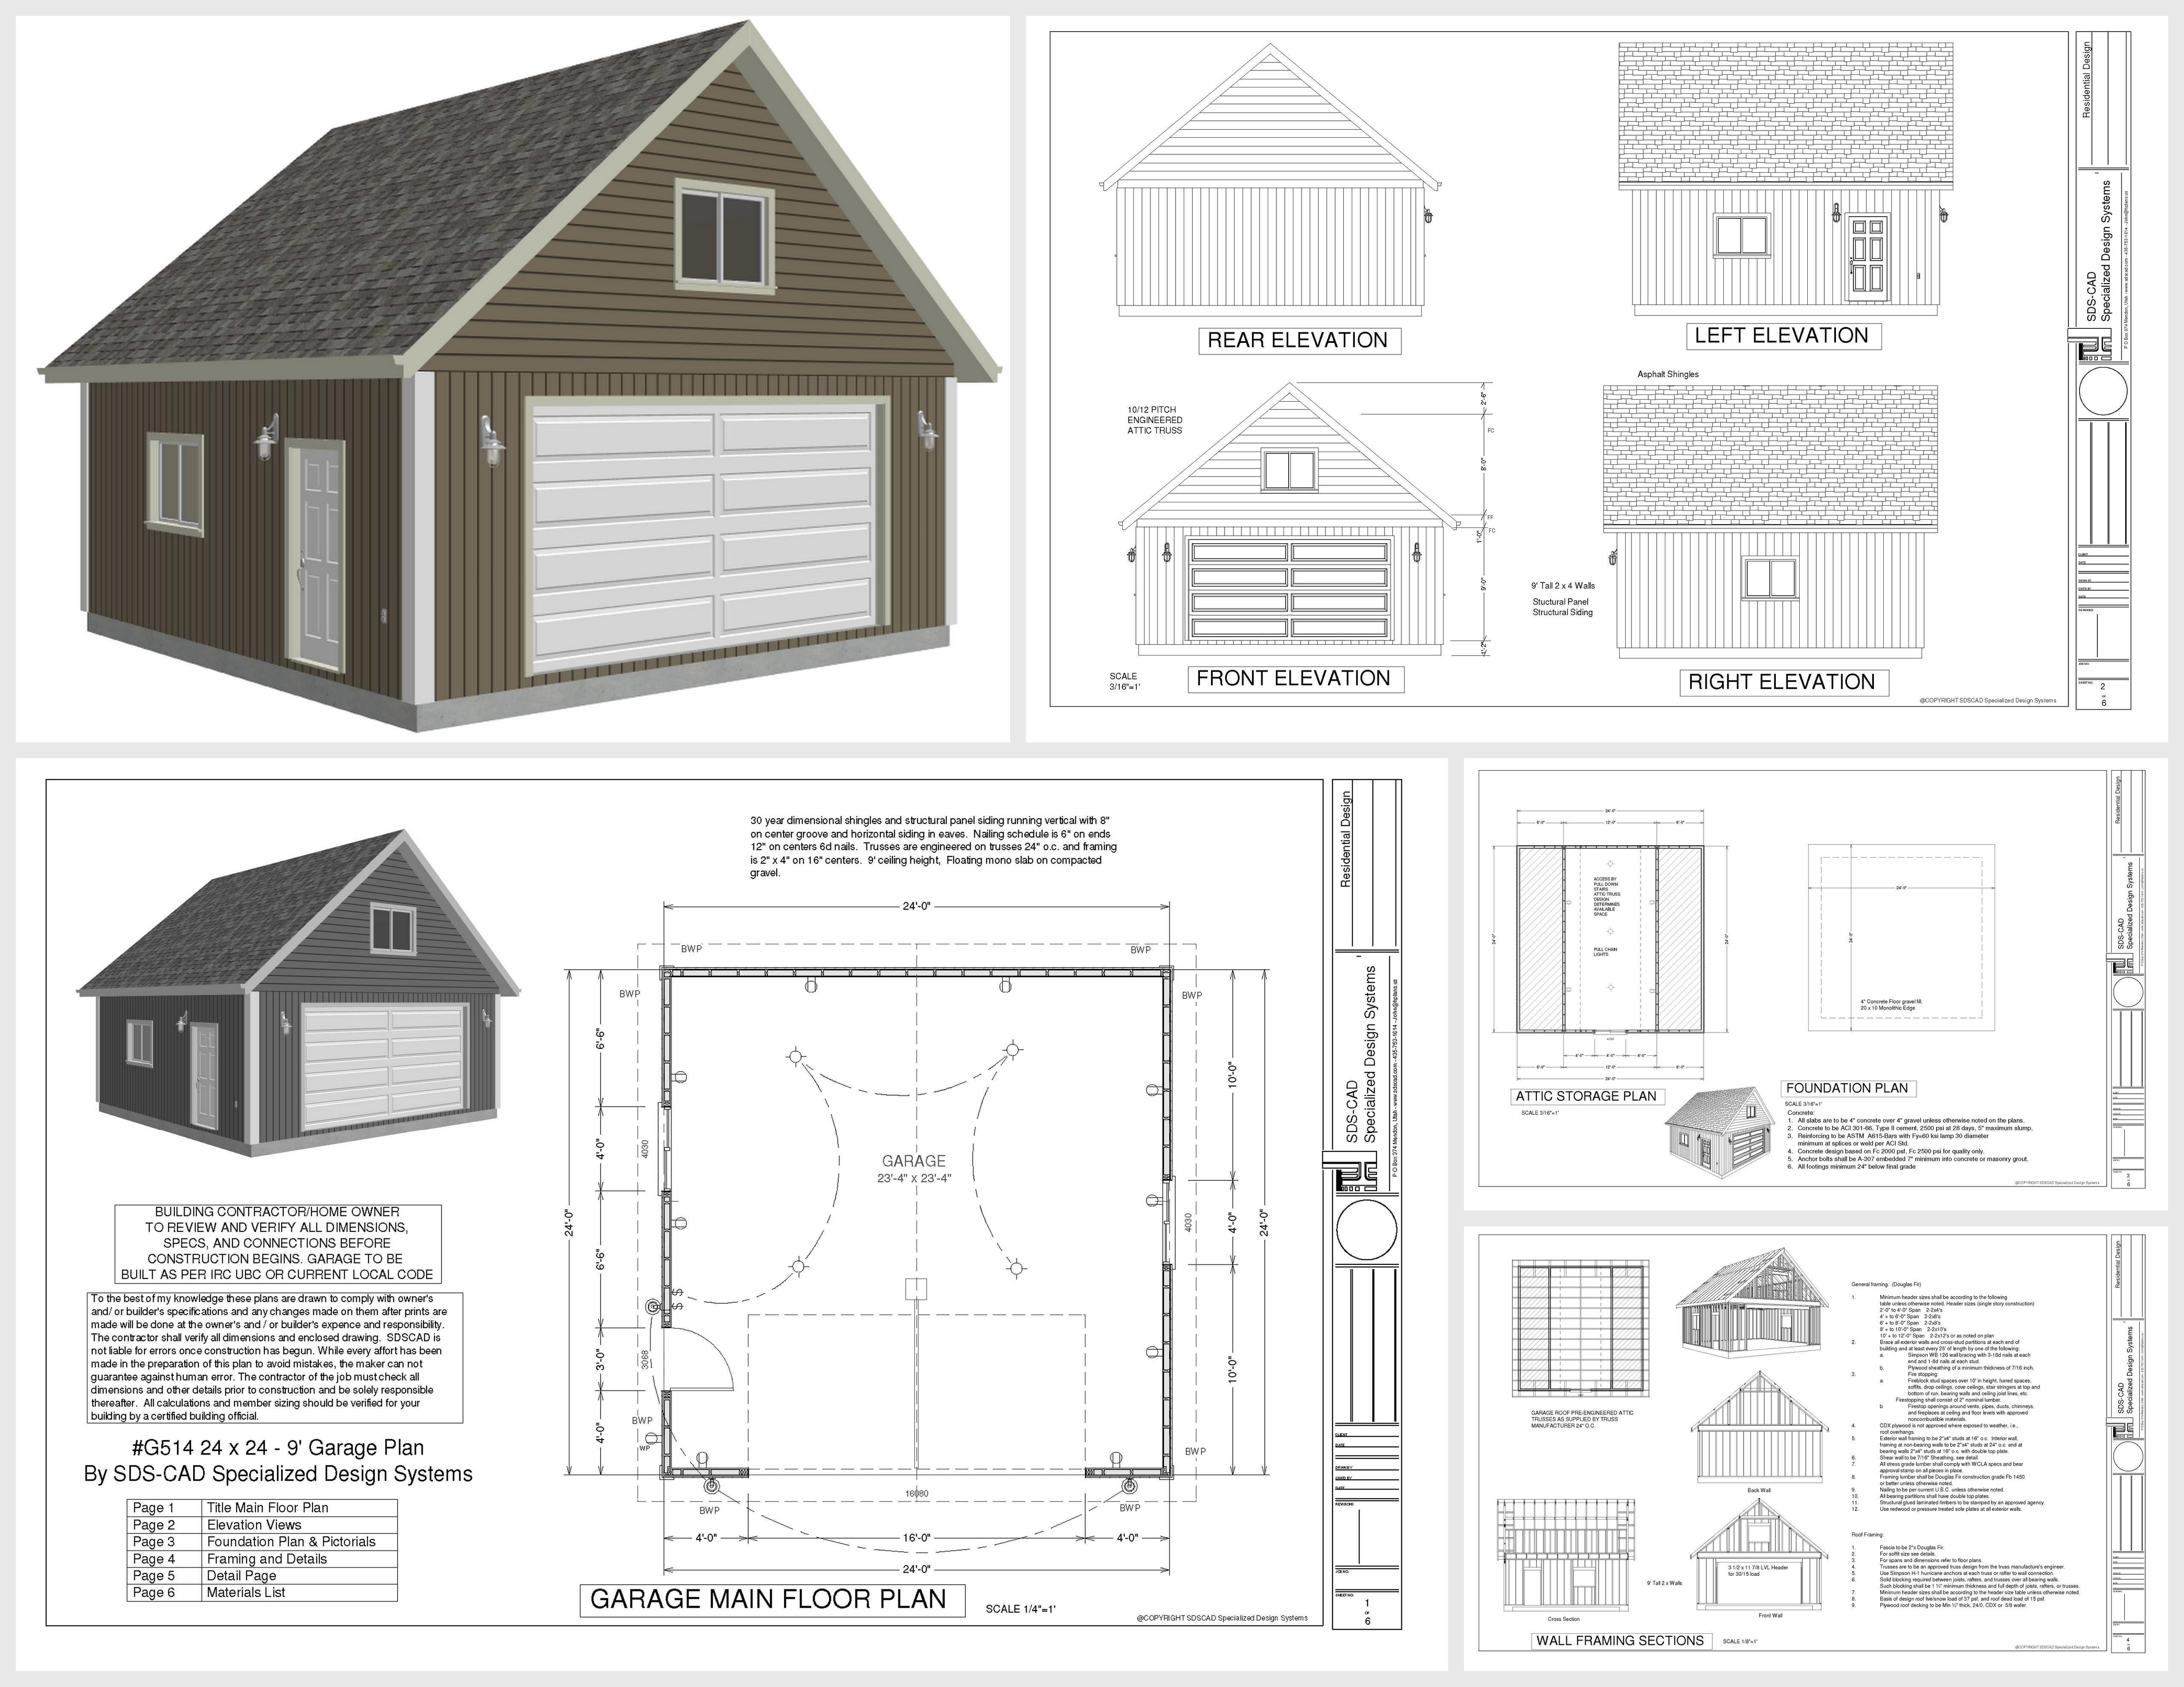 G514 24 X 24 X 9 Loft Garage Plans In Pdf And Dwg